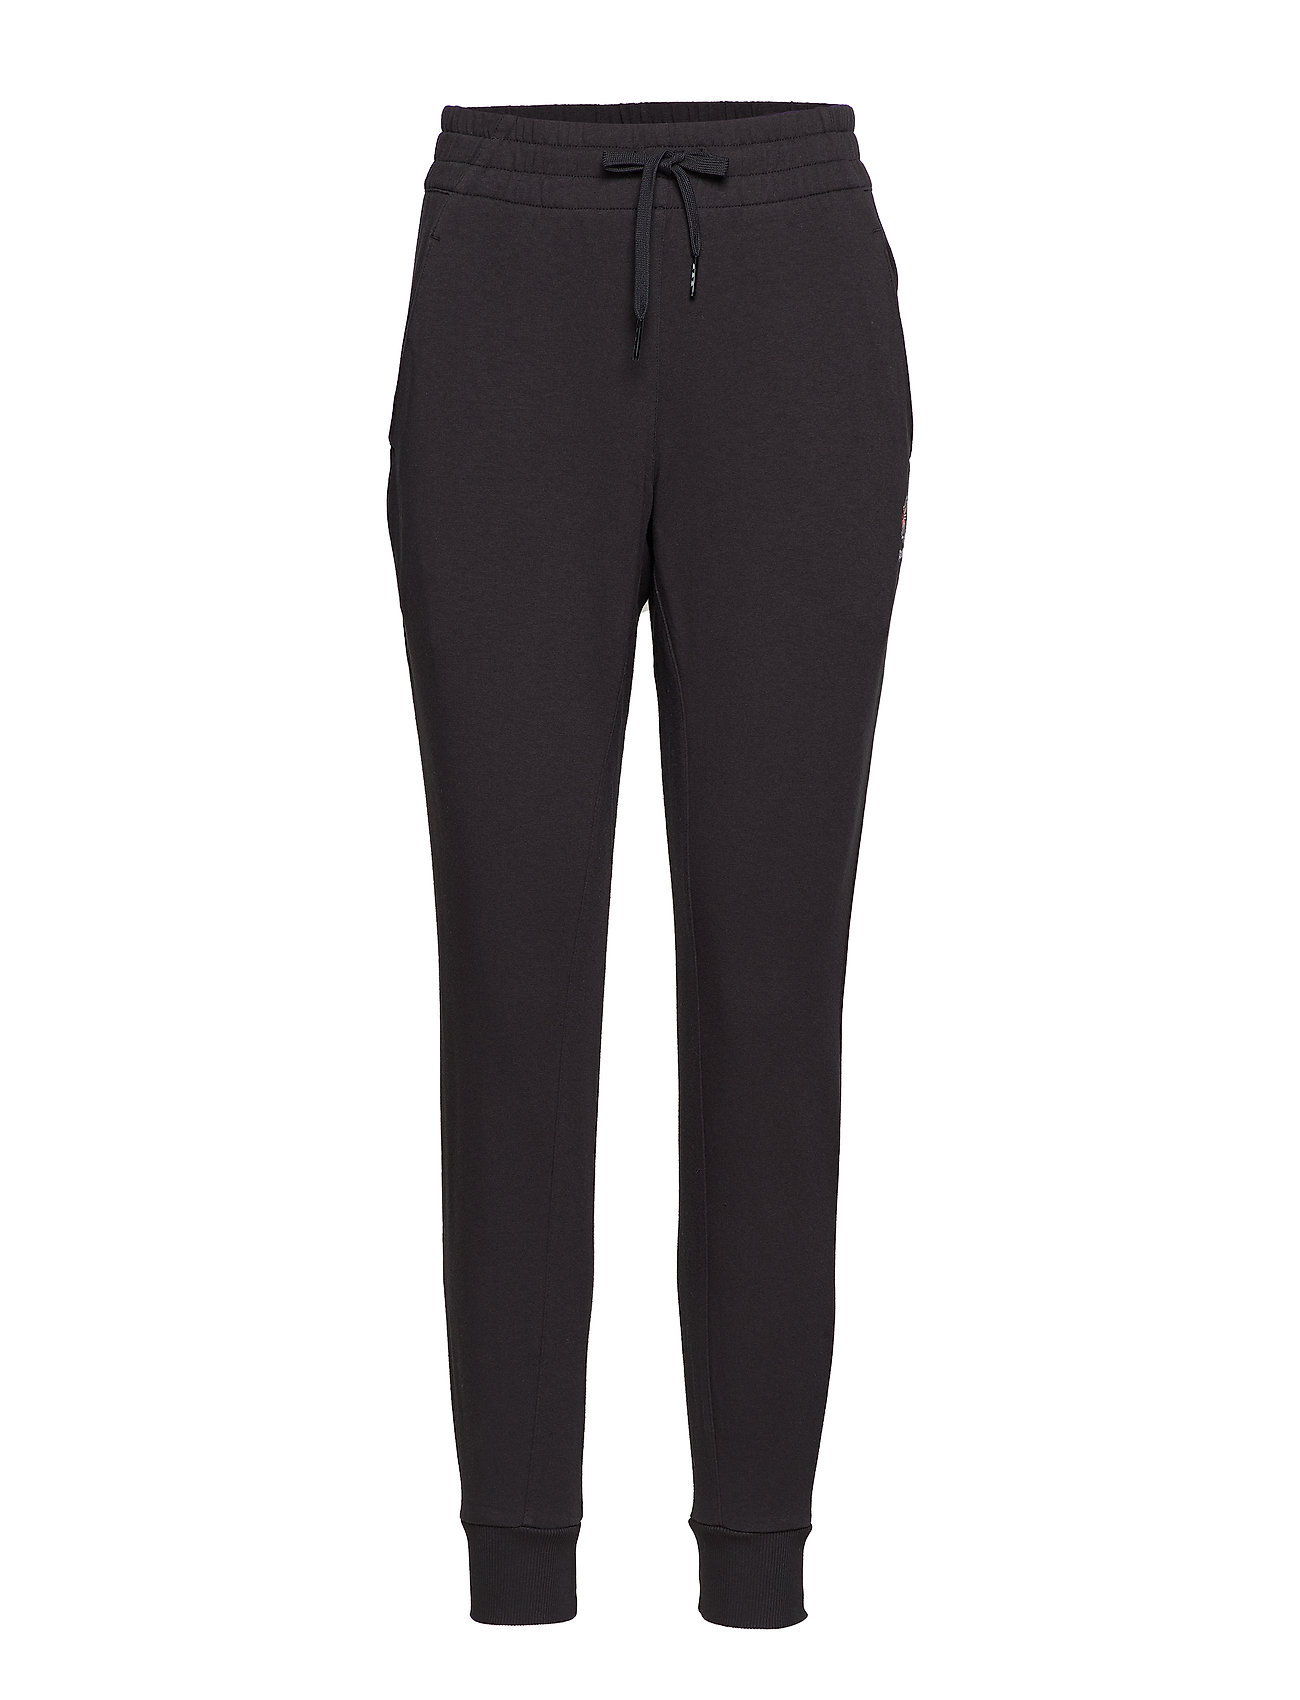 Reebok Classics CL FT PANTS Sweatpants